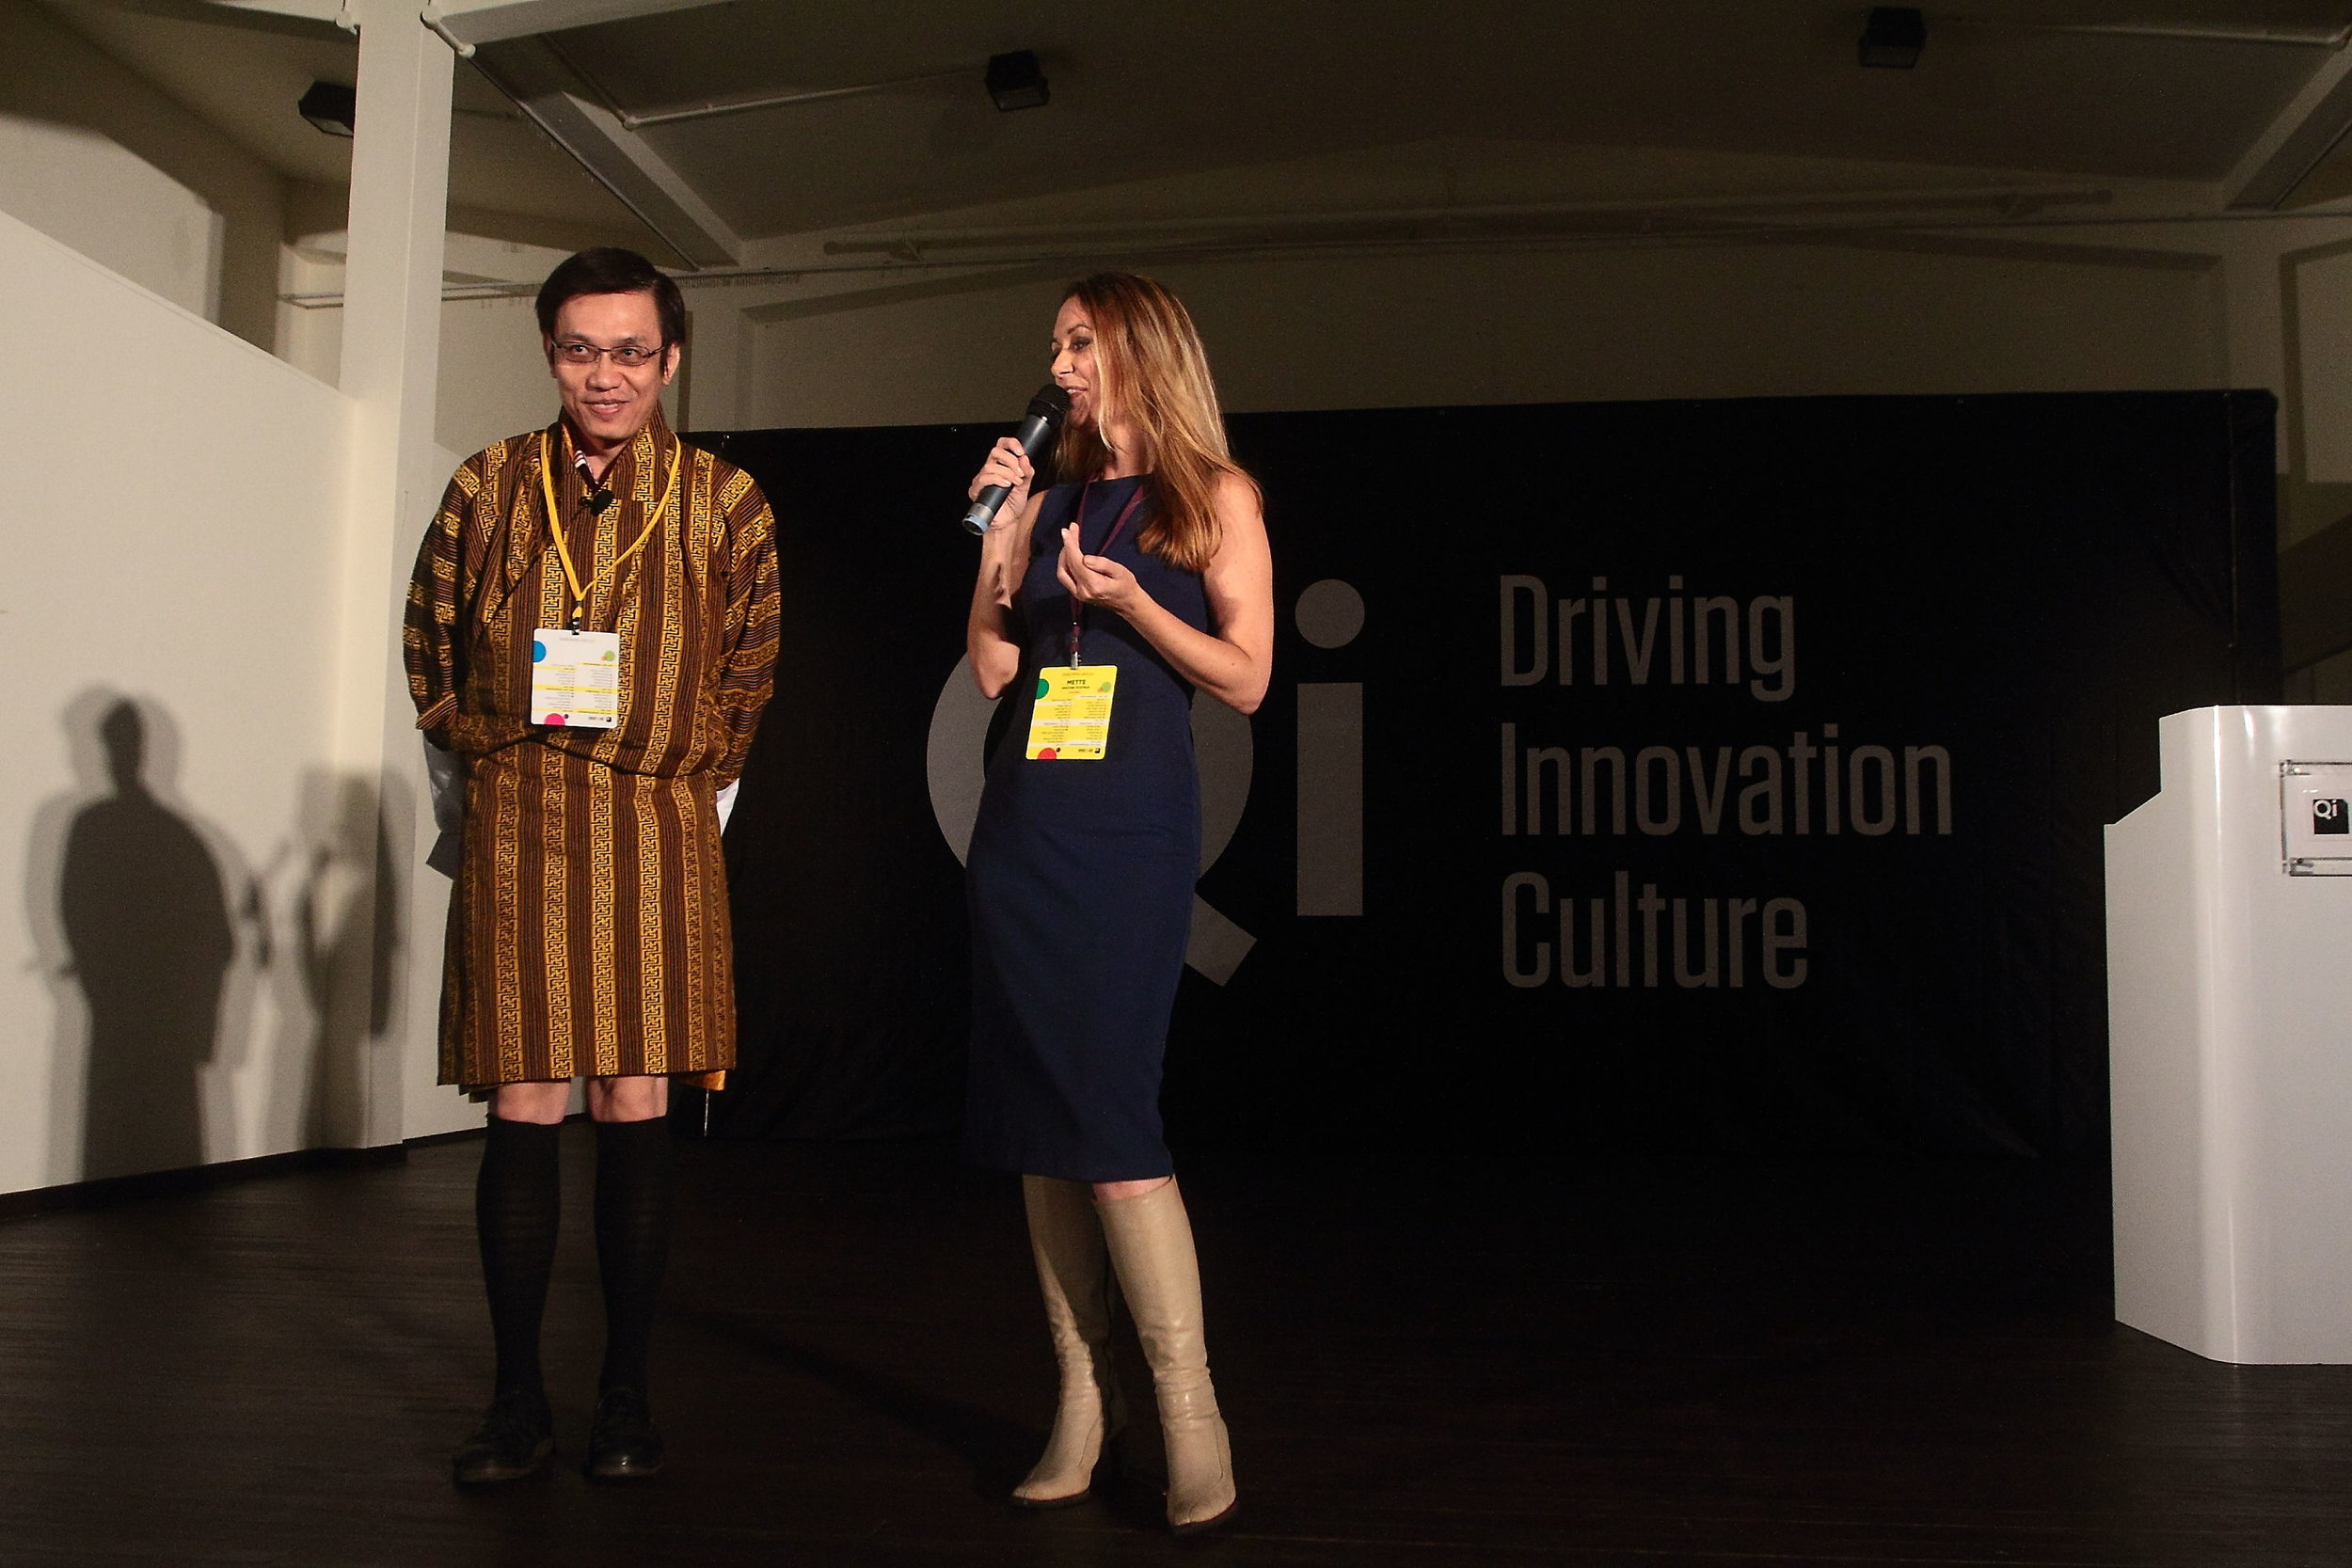 qi-global-2011-driving-innovation-culture-077.jpg